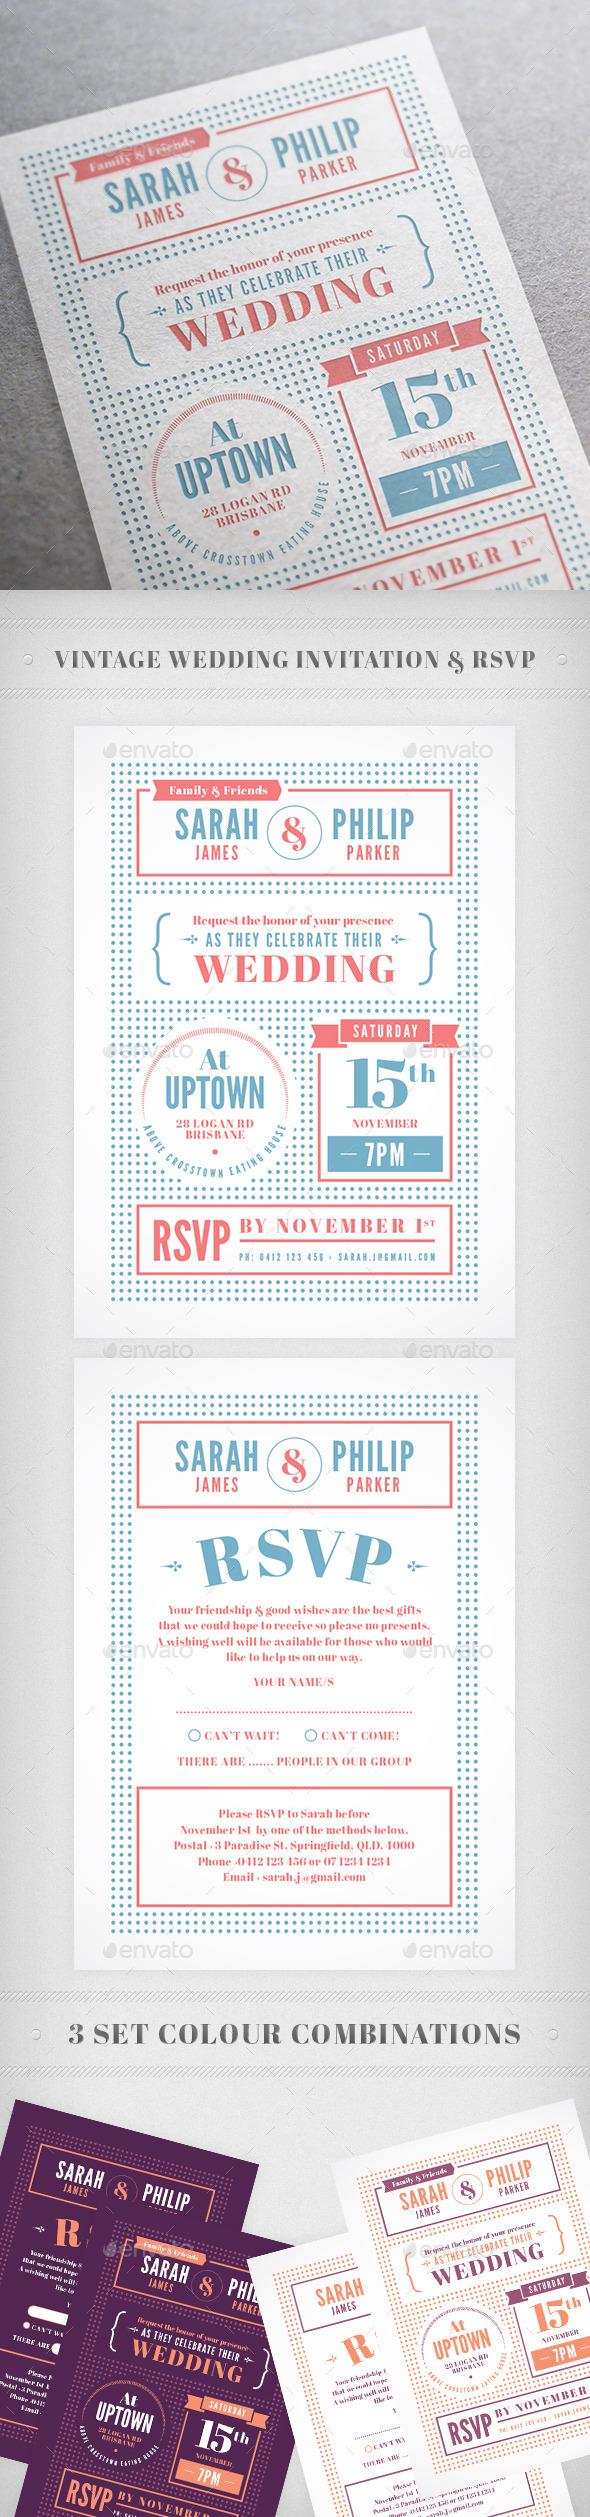 Indie Wedding Invitation - Weddings Cards & Invites